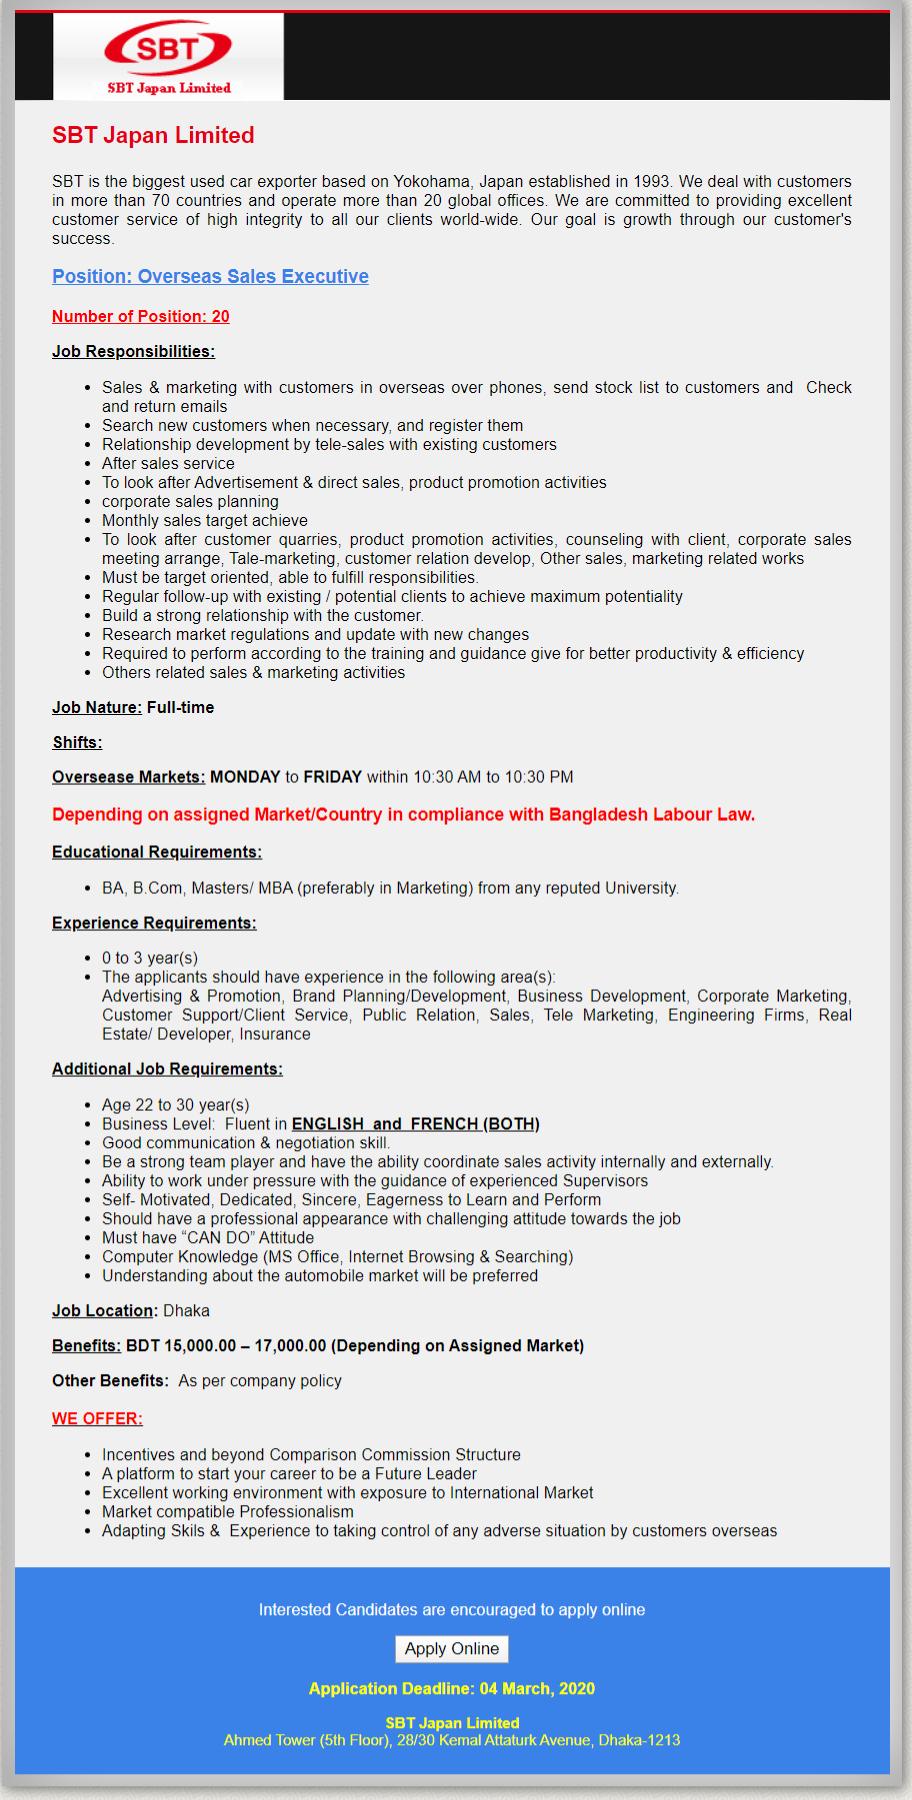 SBT Japan Limited Job Circular 2020